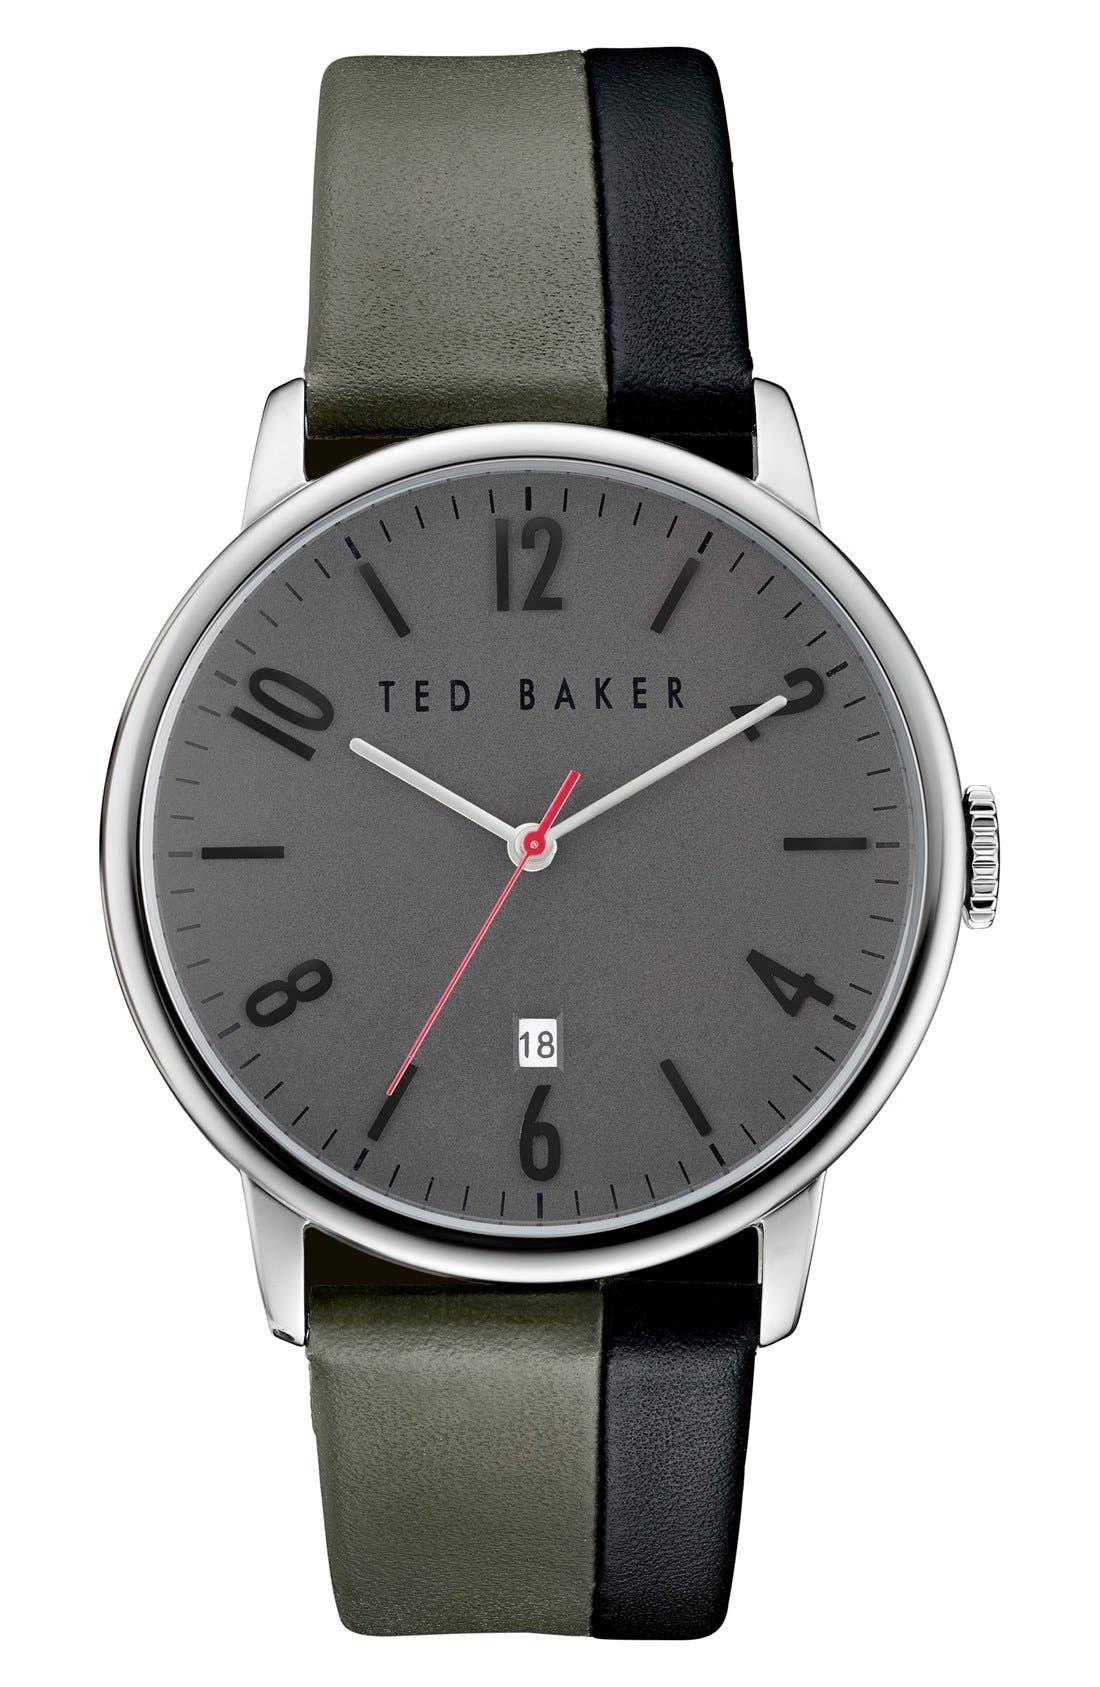 Ted Baker London 'Modern Vintage' Leather Strap Watch, 42mm